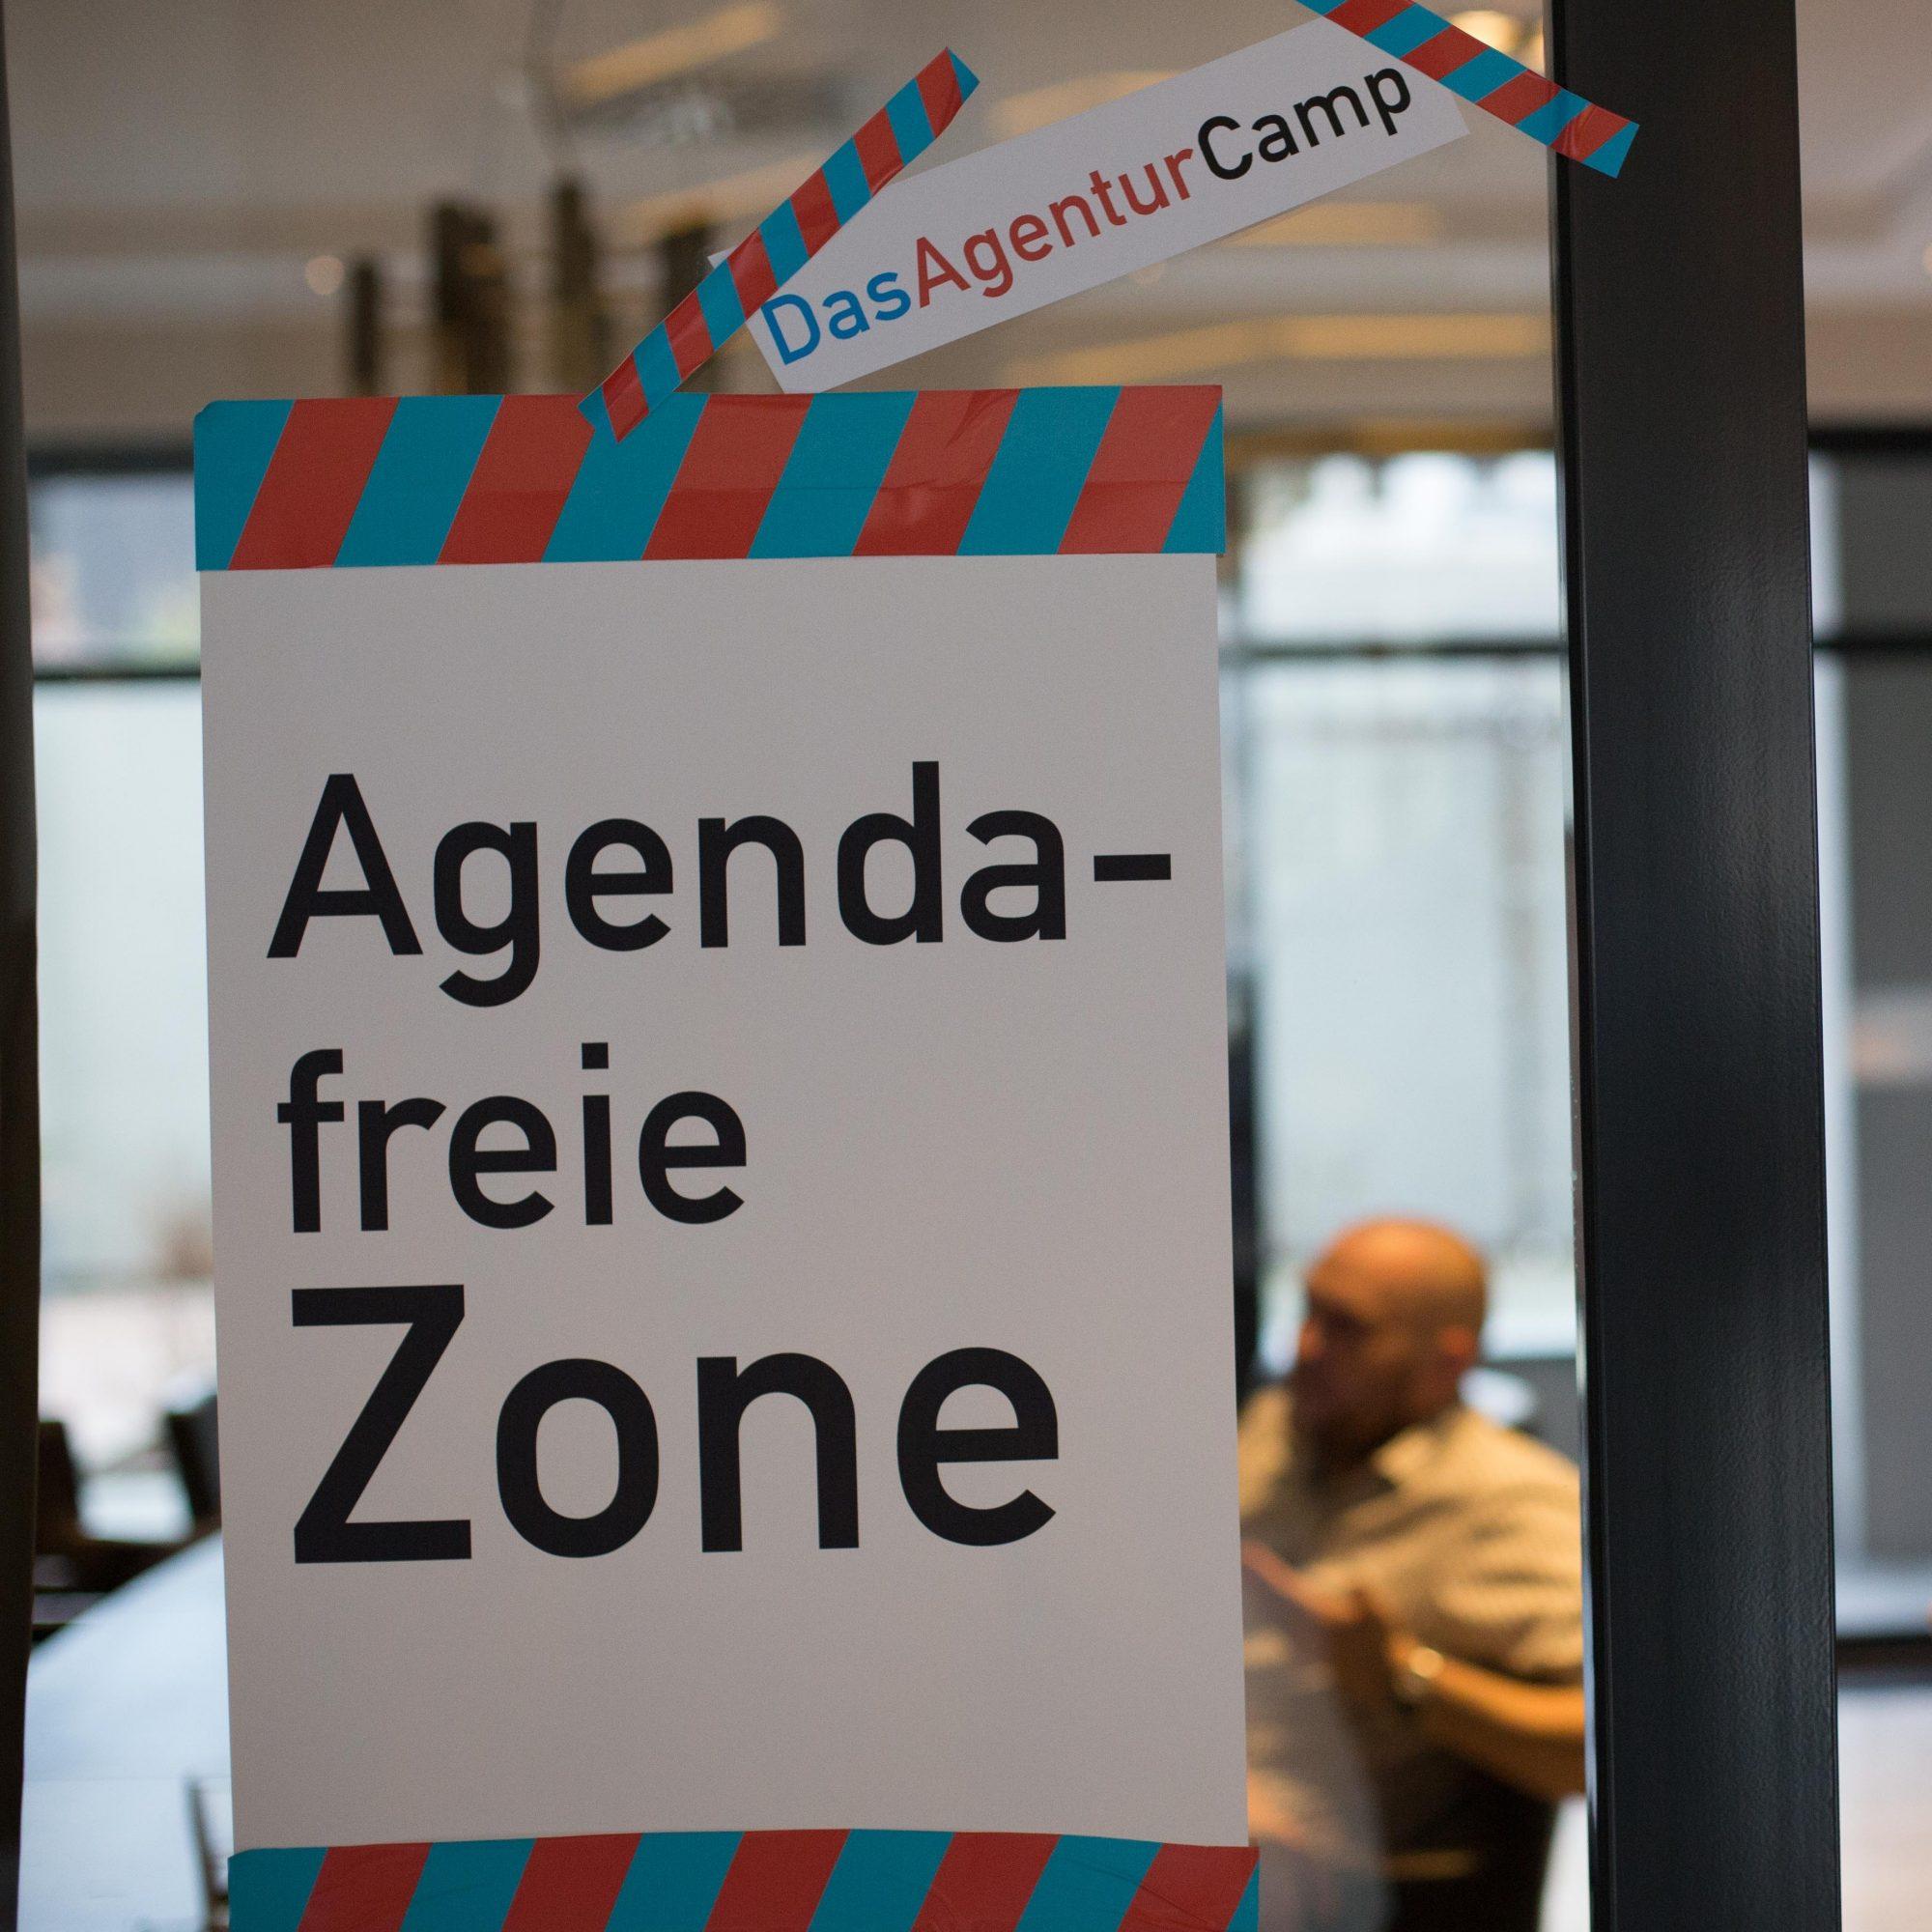 Das AgenturCamp. Agenda-freie Zone